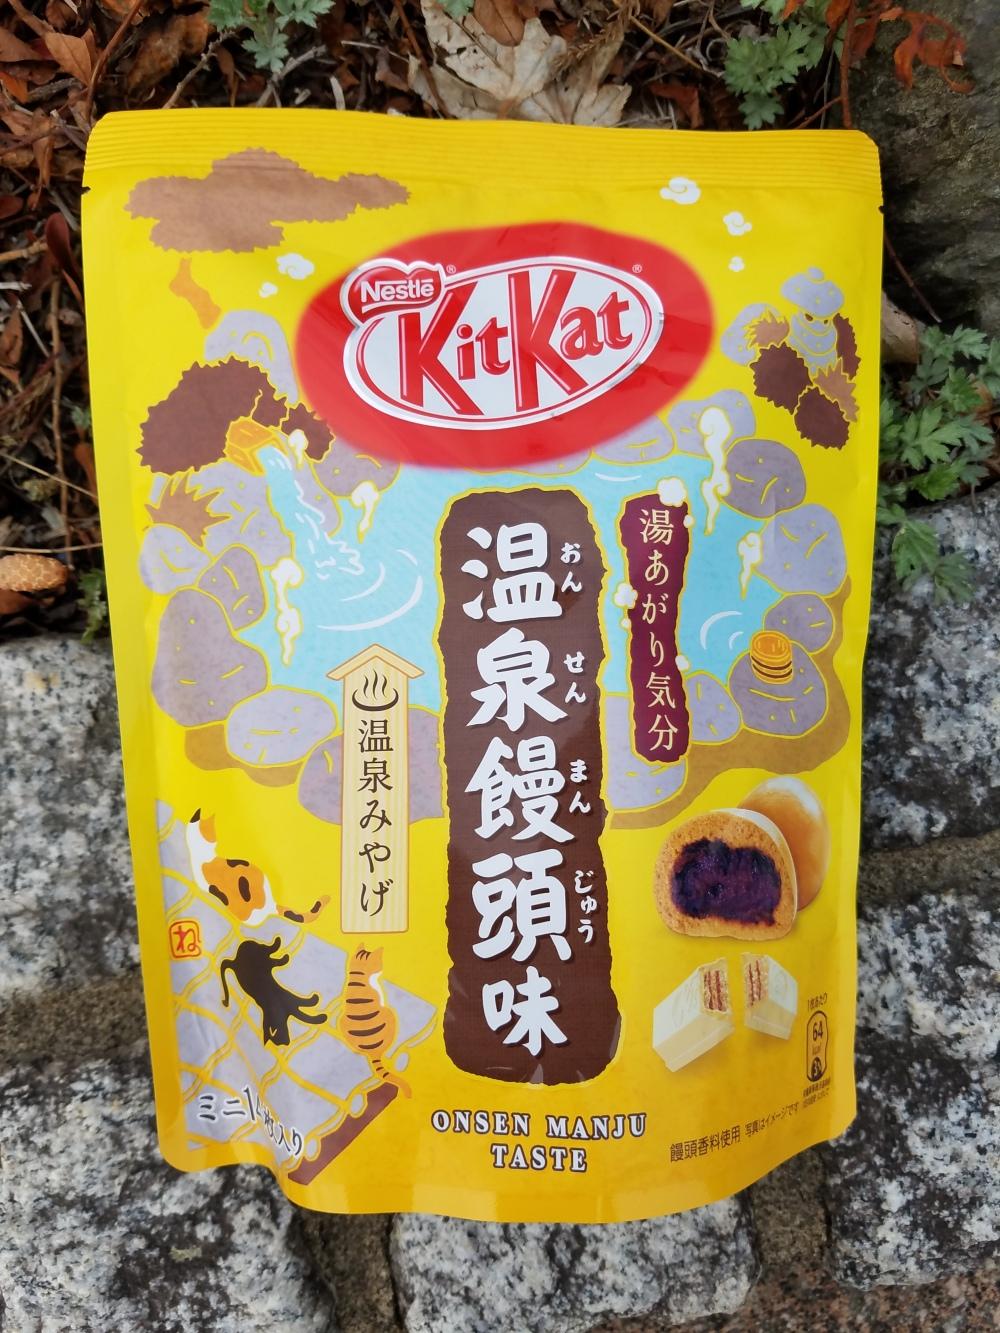 Onsen Bun KitKat - TwoSecondStreet - www.twosecondstreet.com